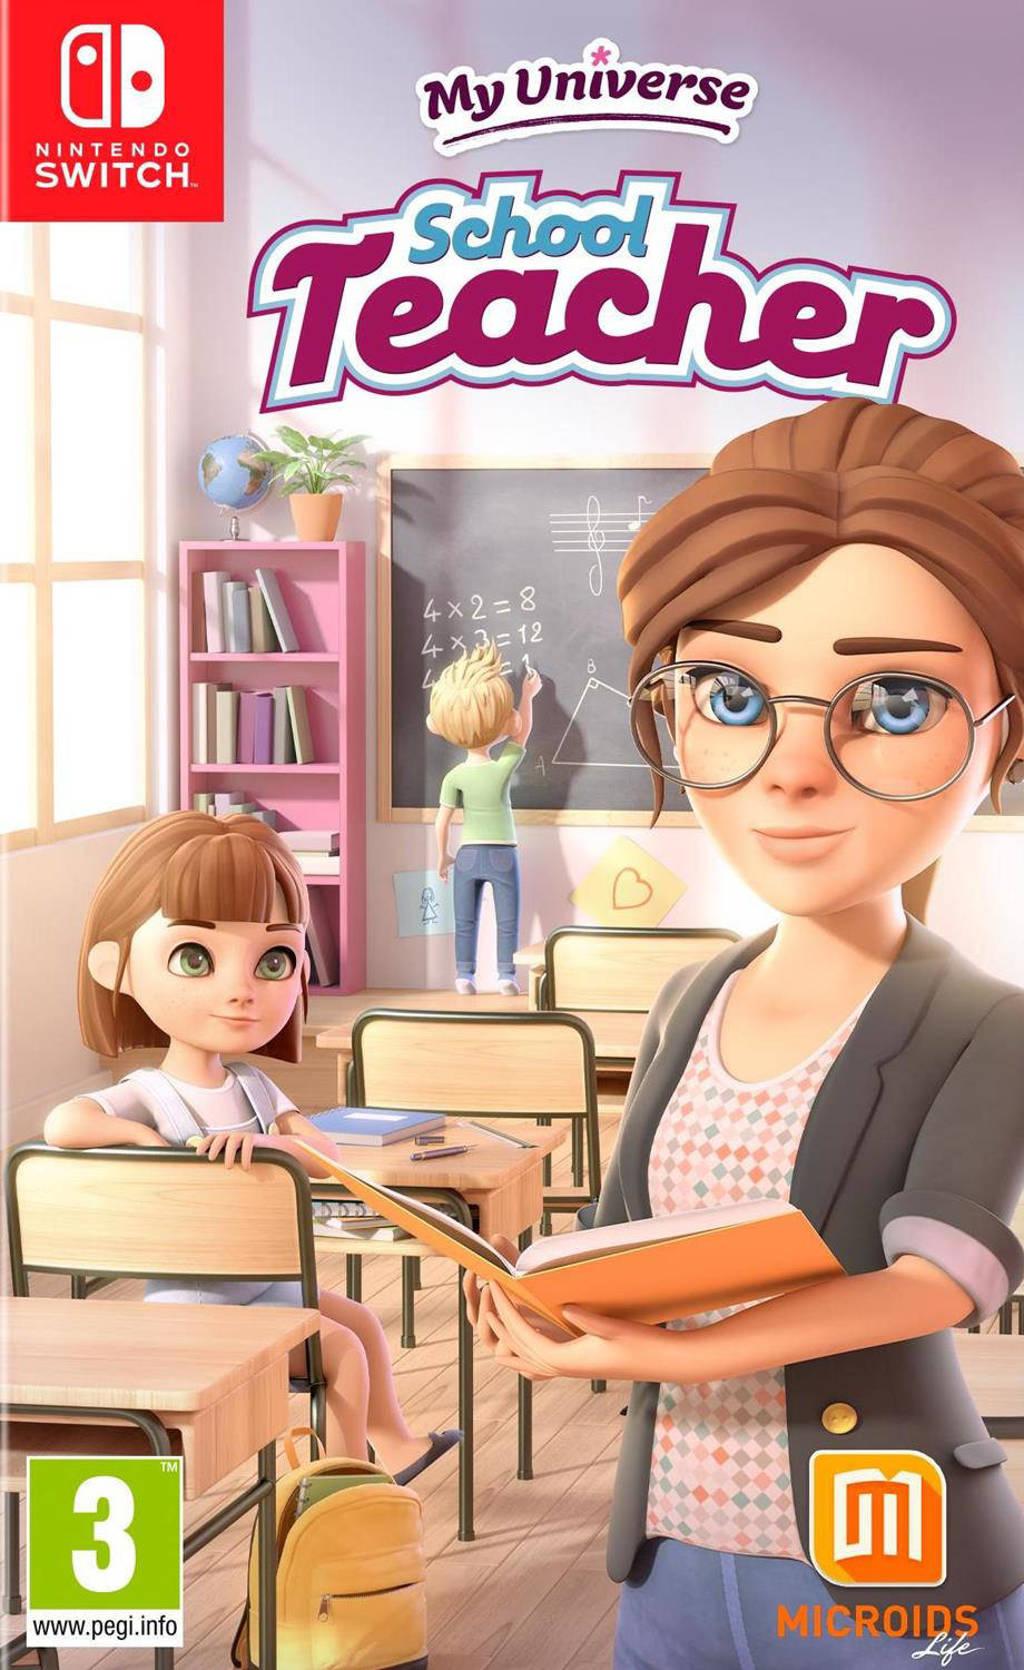 My Universe - School teacher (Nintendo Switch)